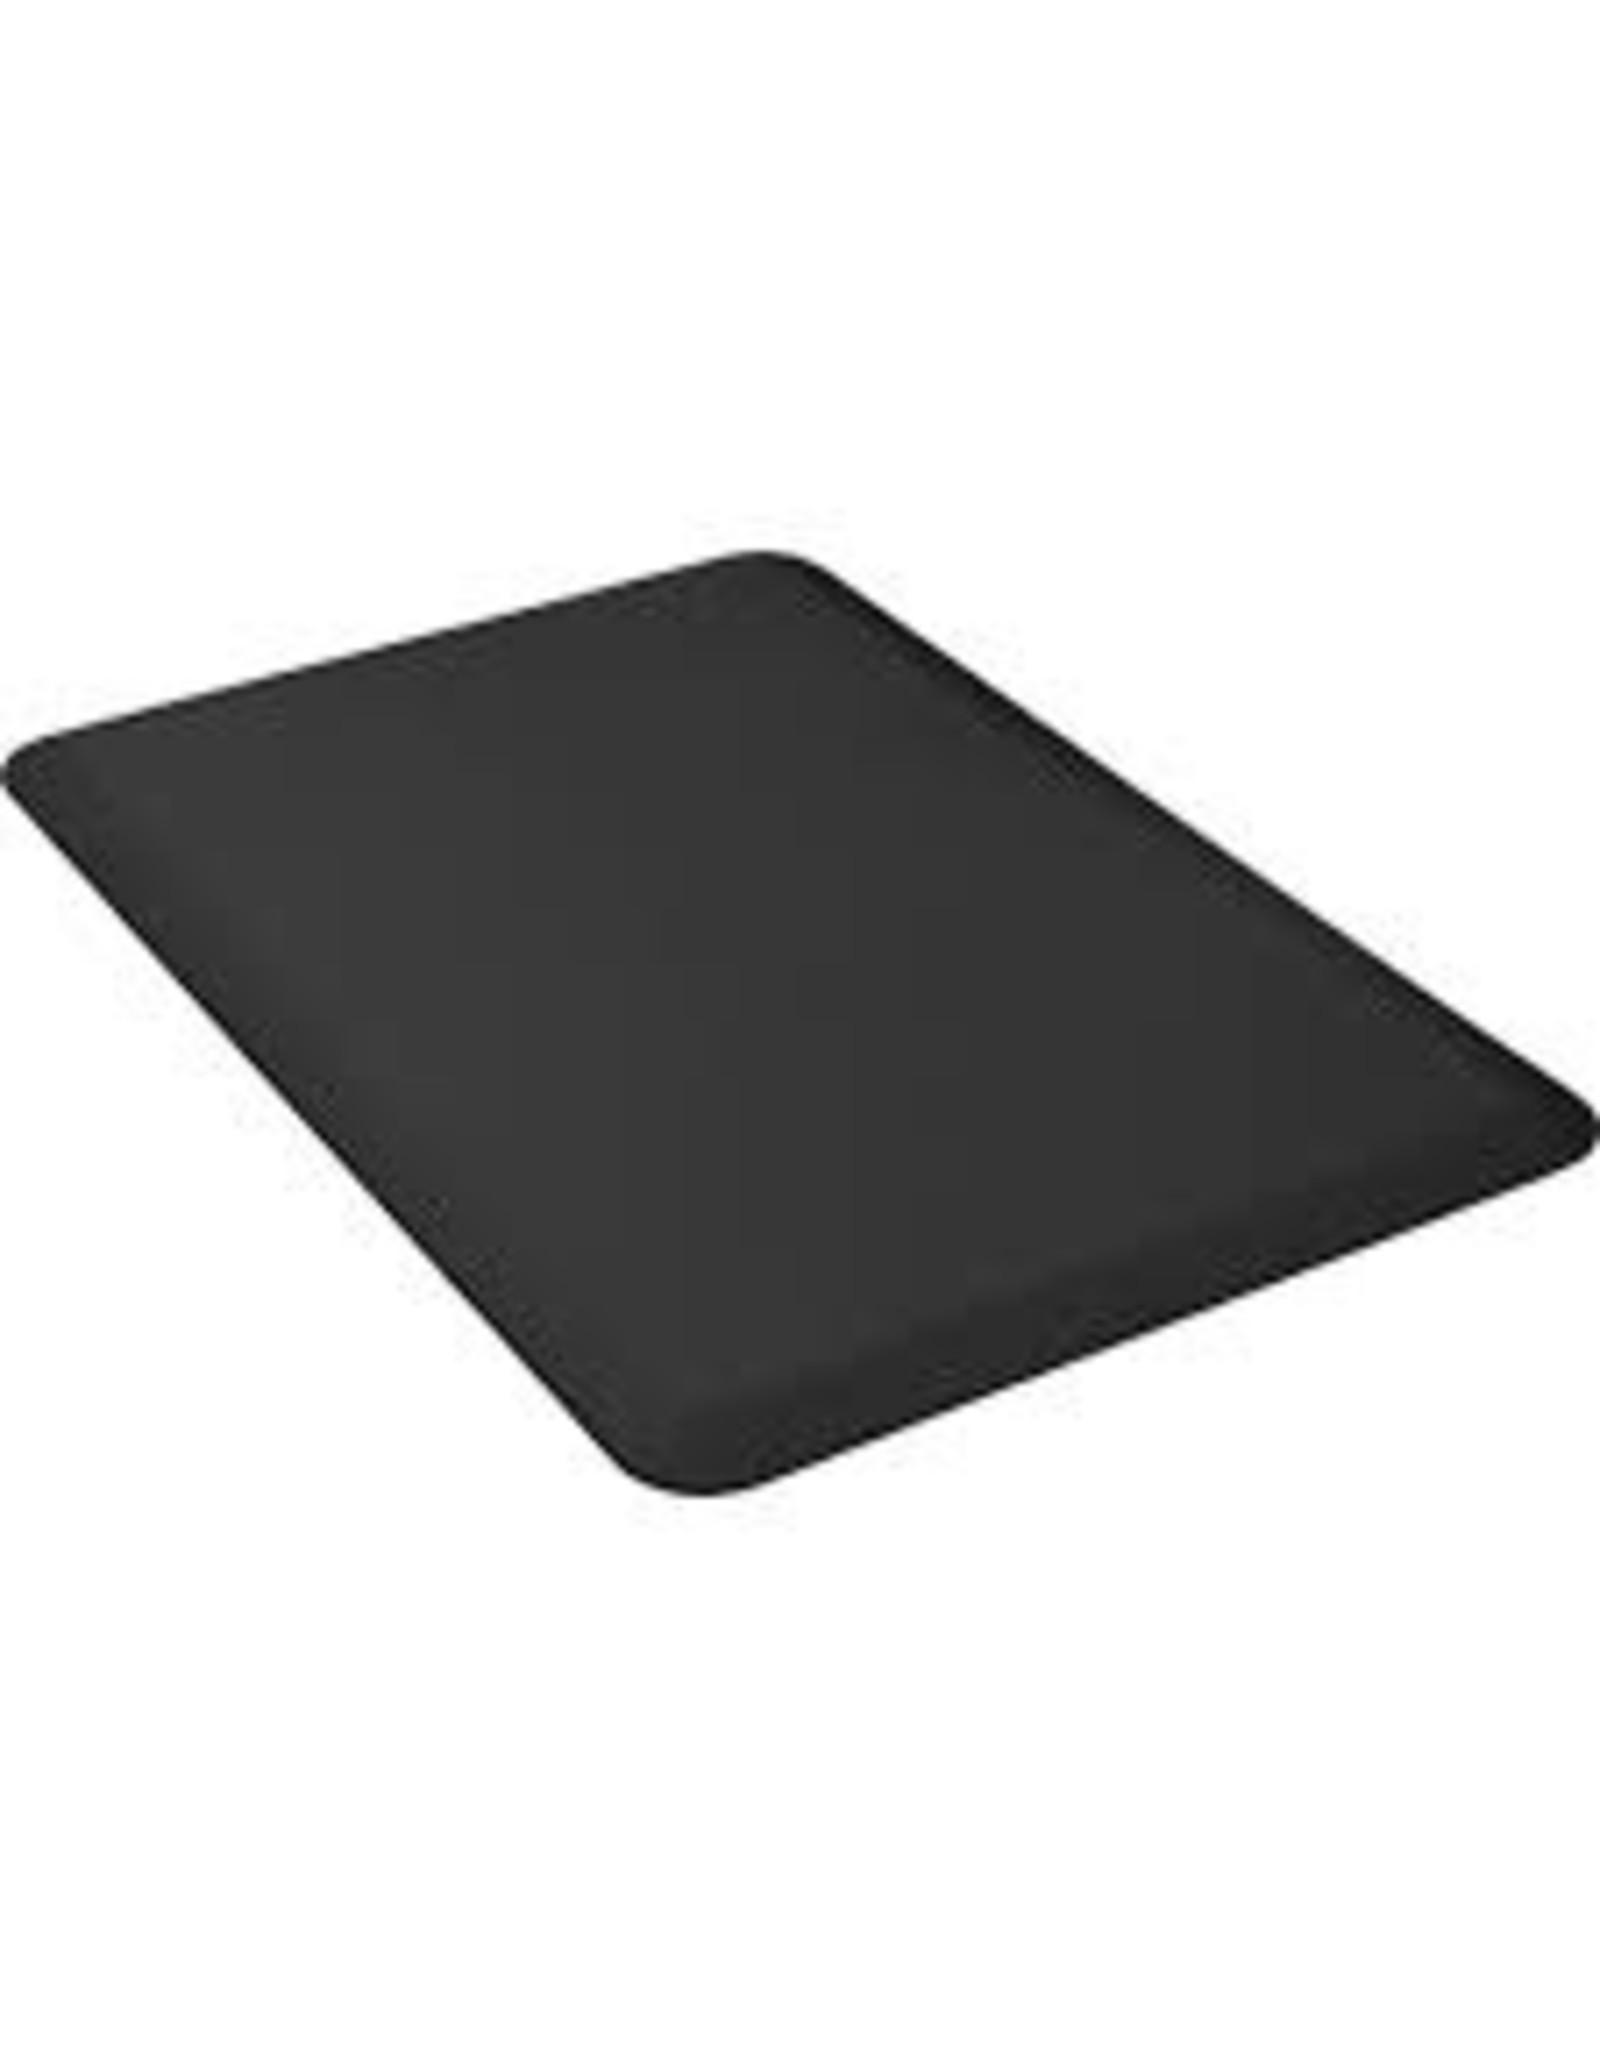 Wellness Mats WM Original Black - 3x2